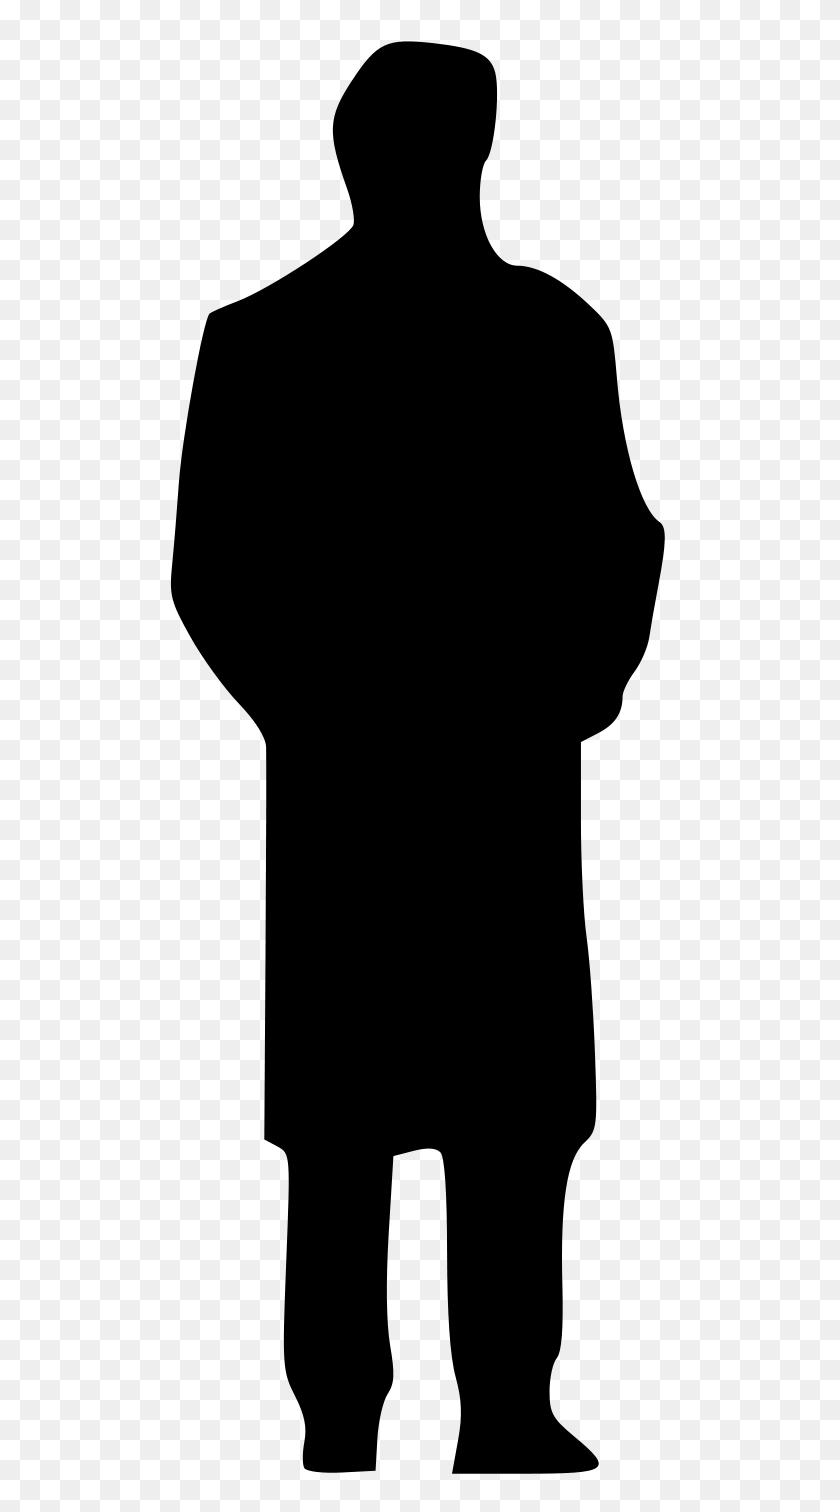 hight resolution of scientist clipart old man scuba diver silhouette clip art